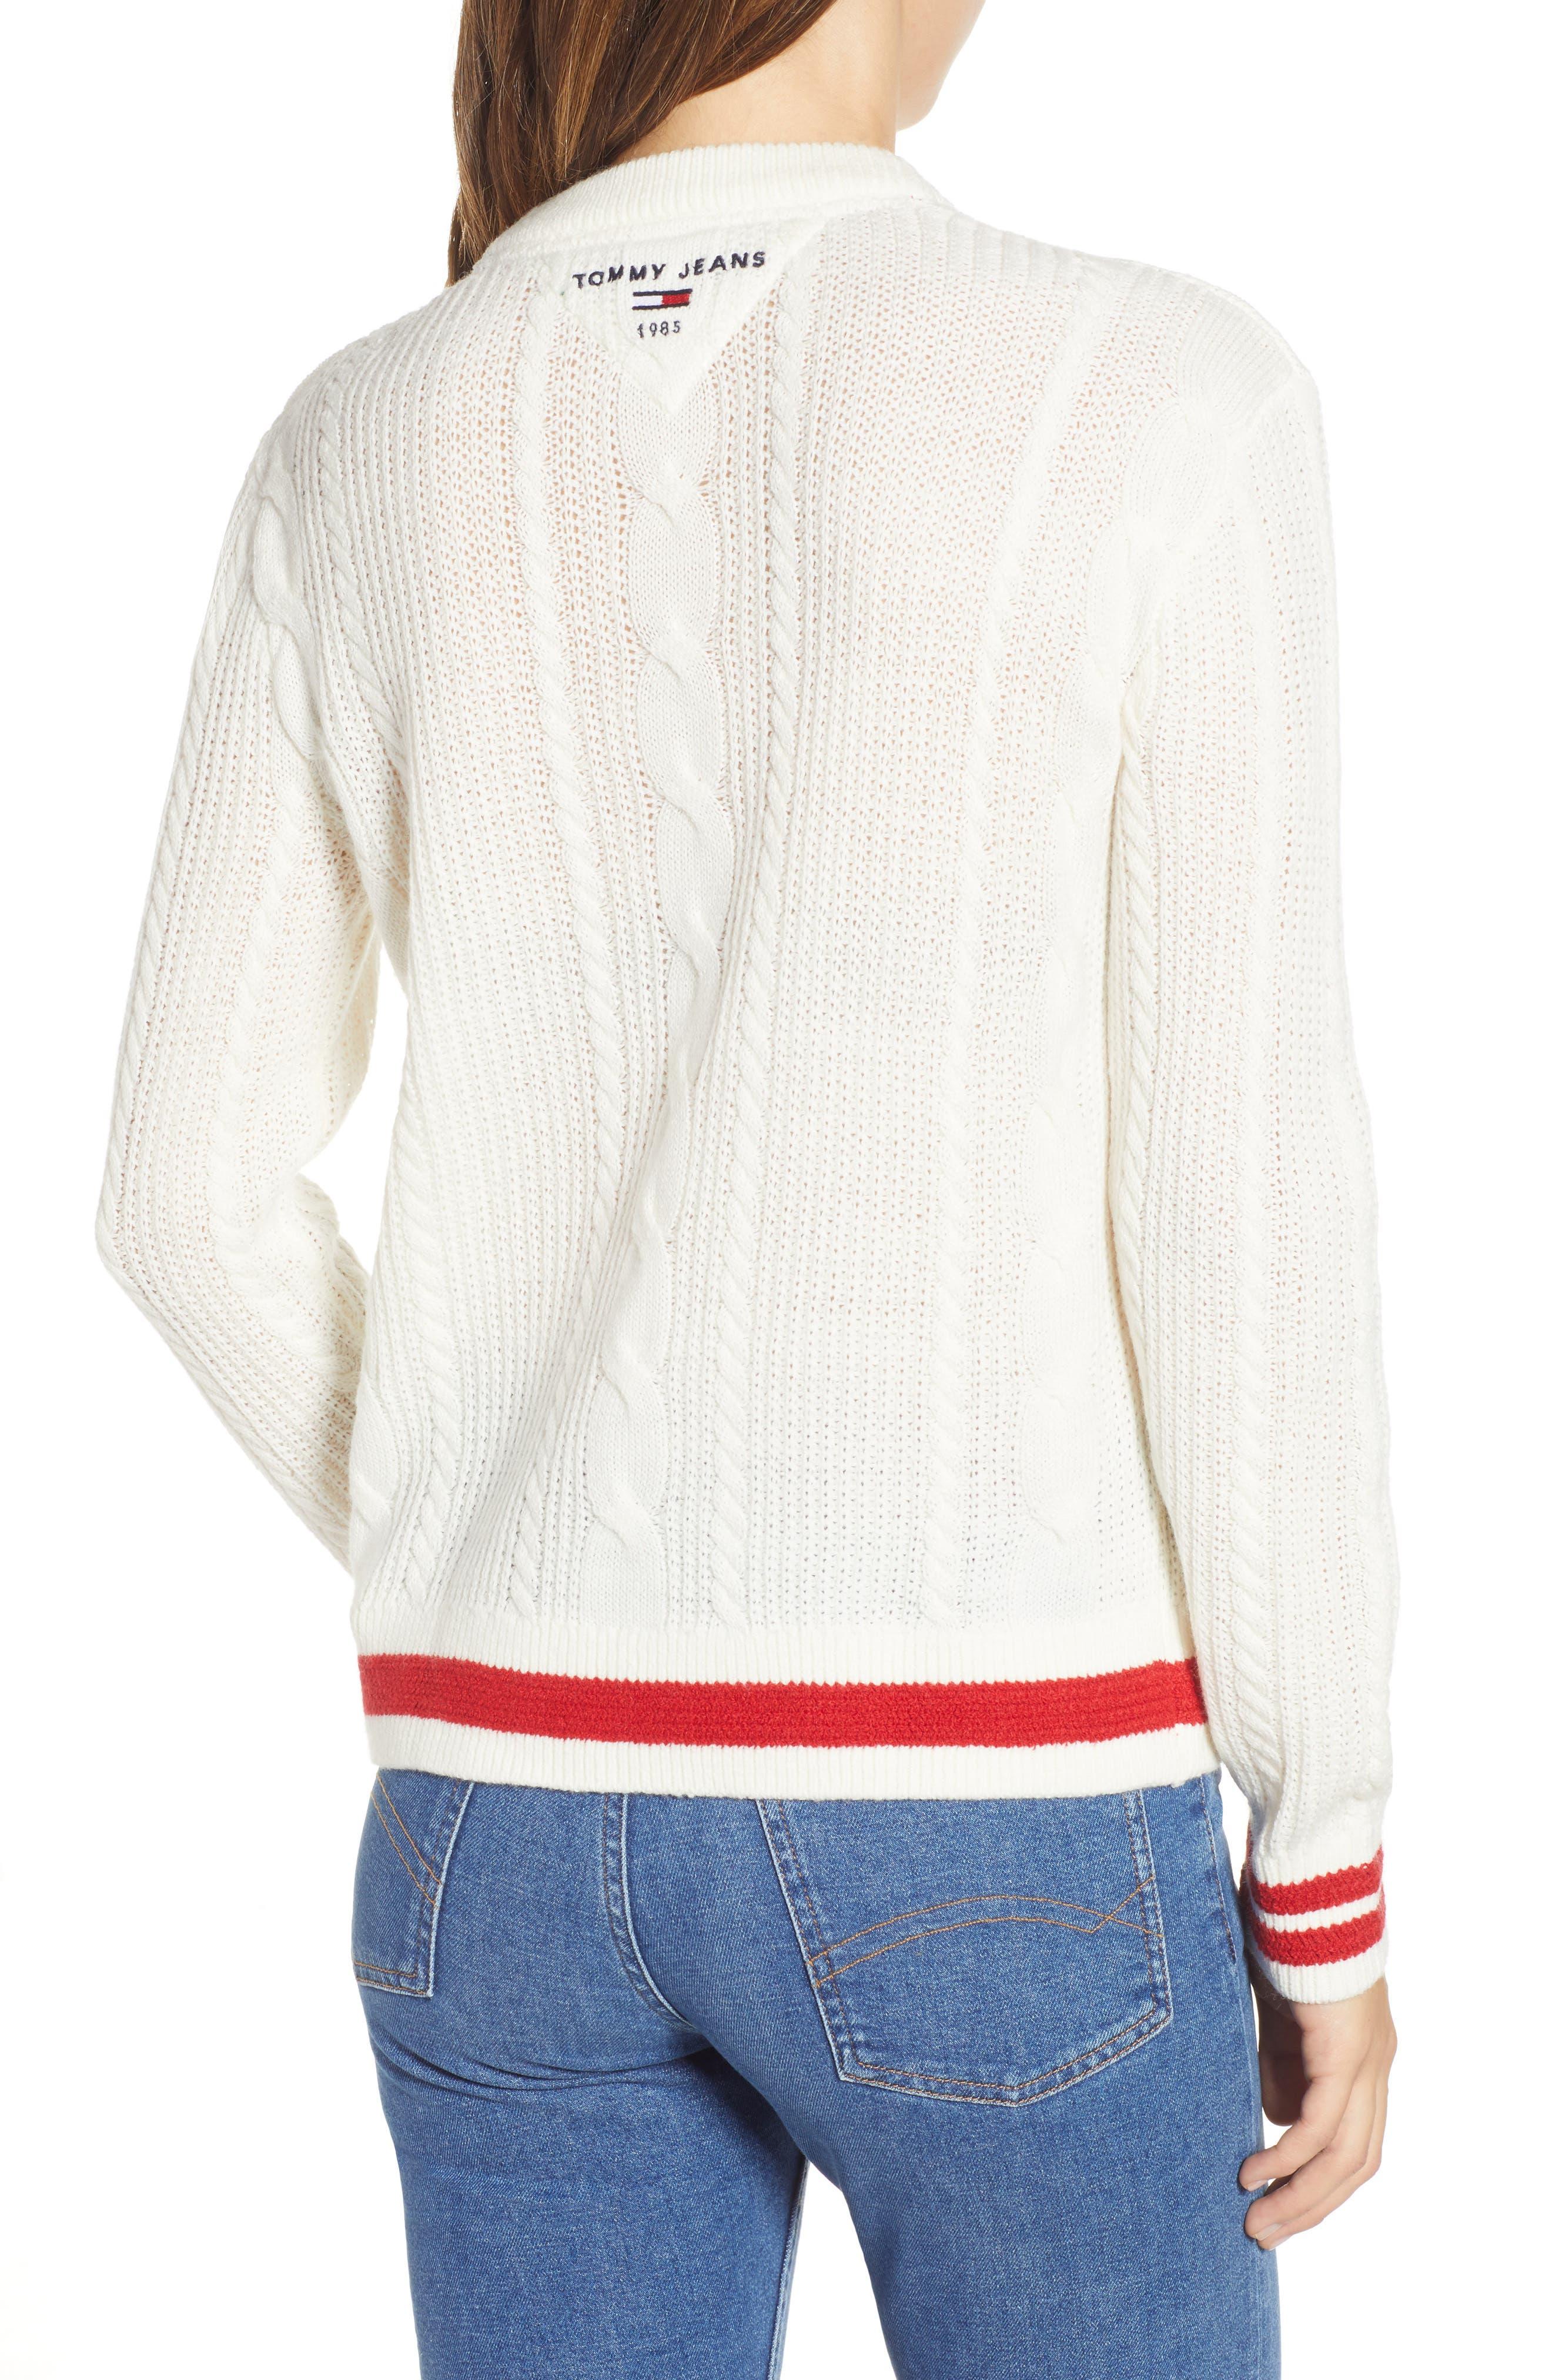 TJW Cable Knit Sweater,                             Alternate thumbnail 2, color,                             CLOUD DANCER